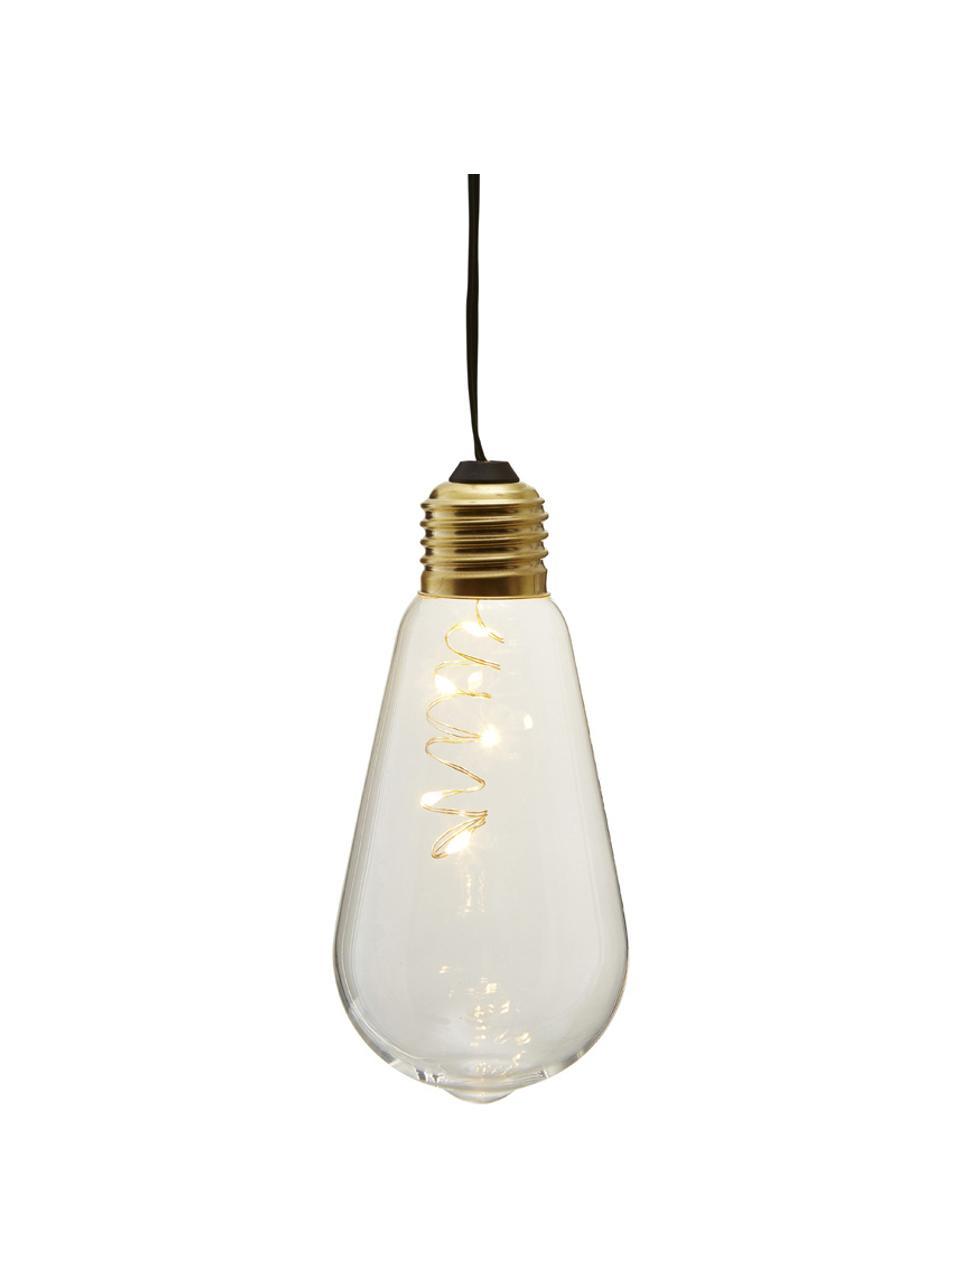 LED-Dekoleuchten Glow, 2 Stück, Lampenschirm: Glas, Transparent, Ø 6 x H 13 cm